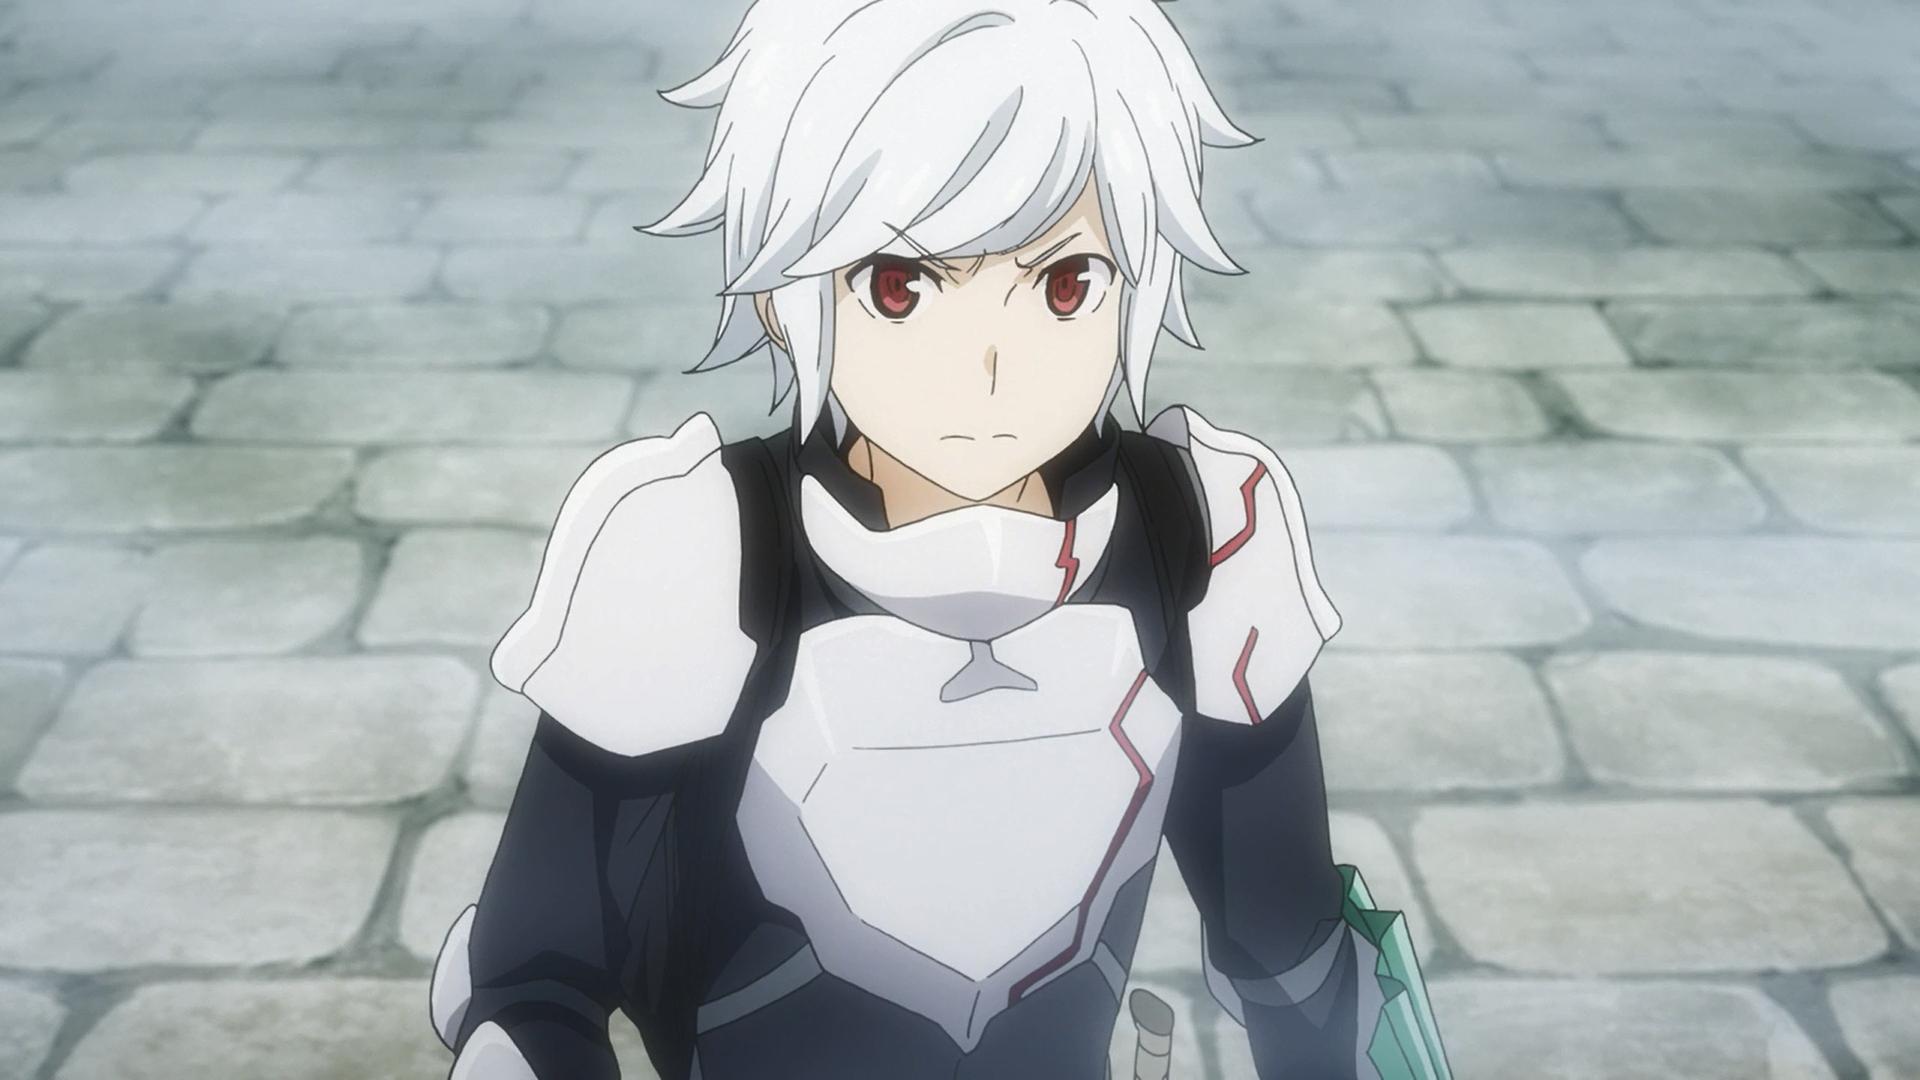 12 Tokoh Anime Berambut Putih/Perak, Manakah Favorit Mu? 10